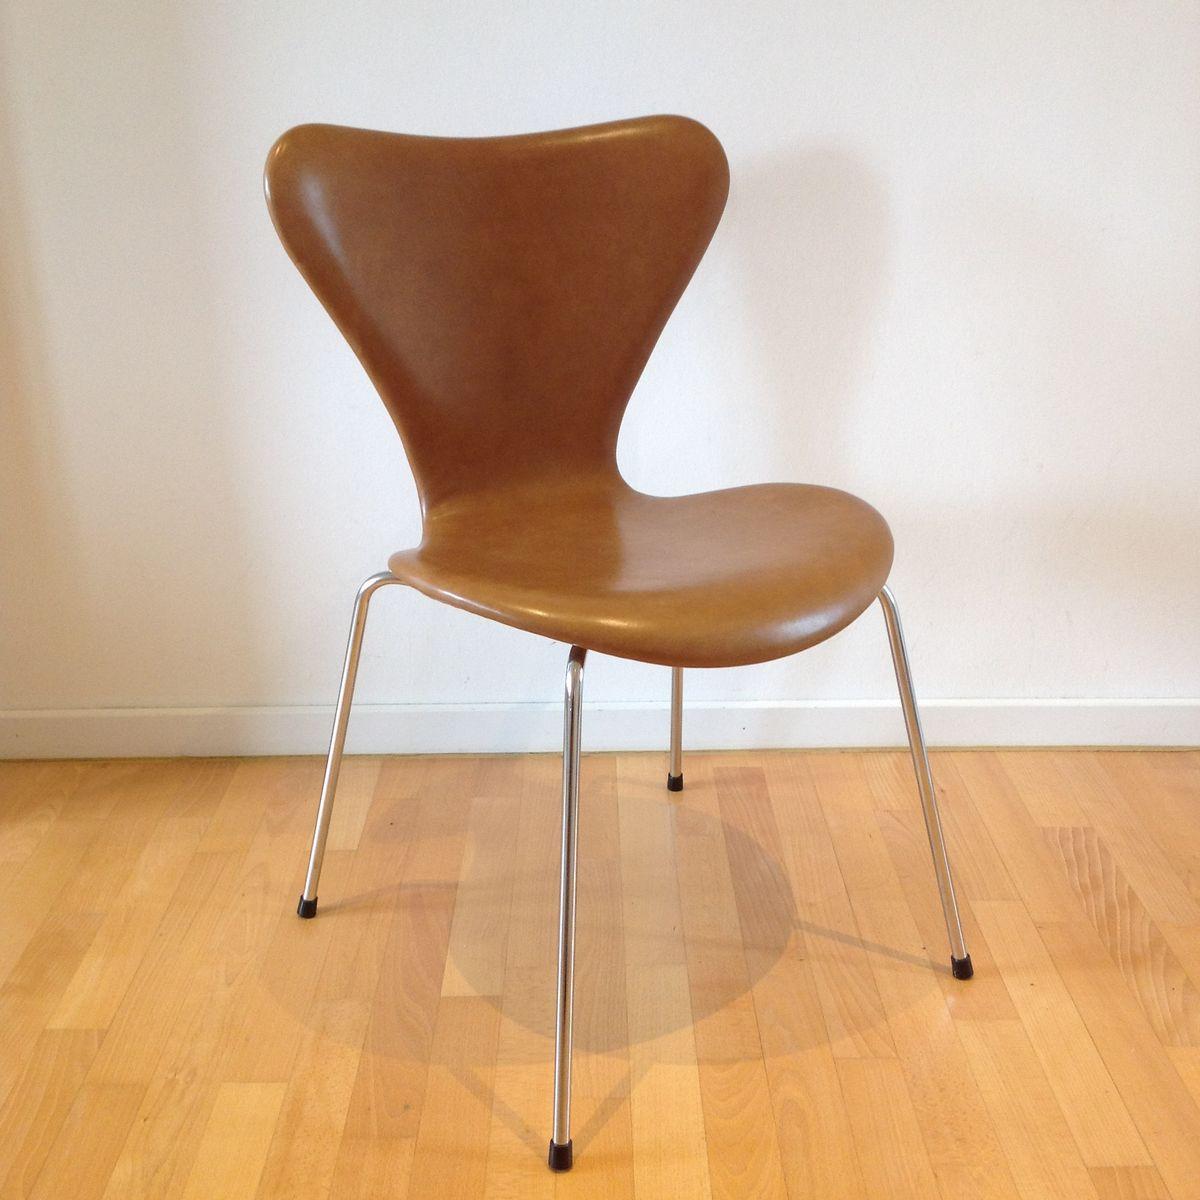 3107 Syveren Elegance Dining Chair In Brown By Arne Jacobsen For Fritz Hansen